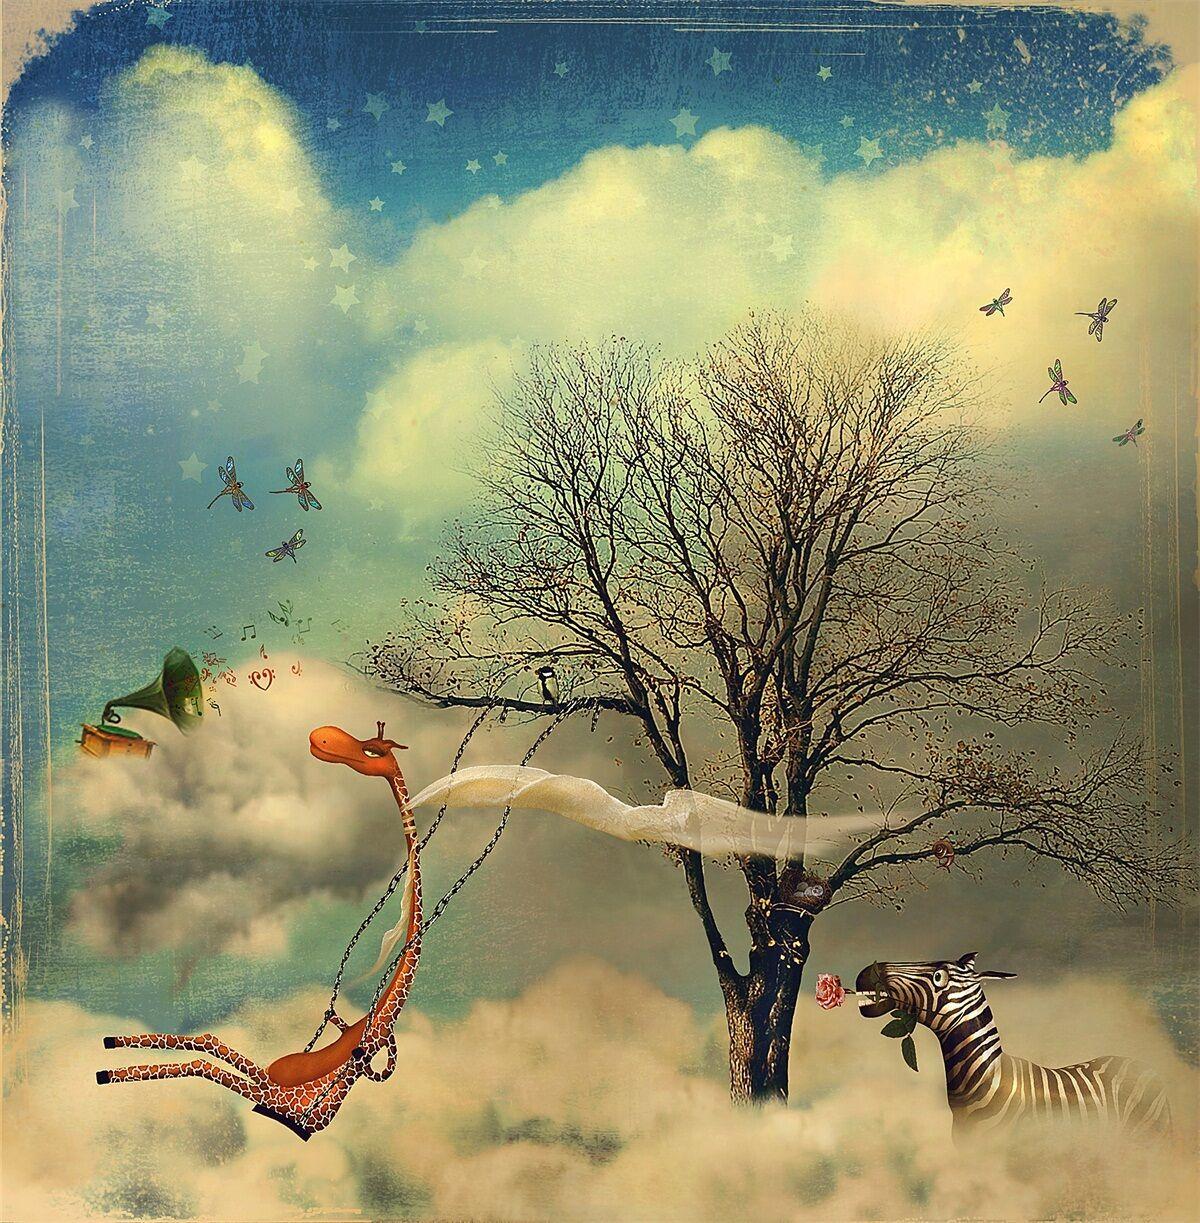 3D Giraffe, Baum 266 Fototapeten Wandbild Fototapete Bild Tapete Familie Kinder